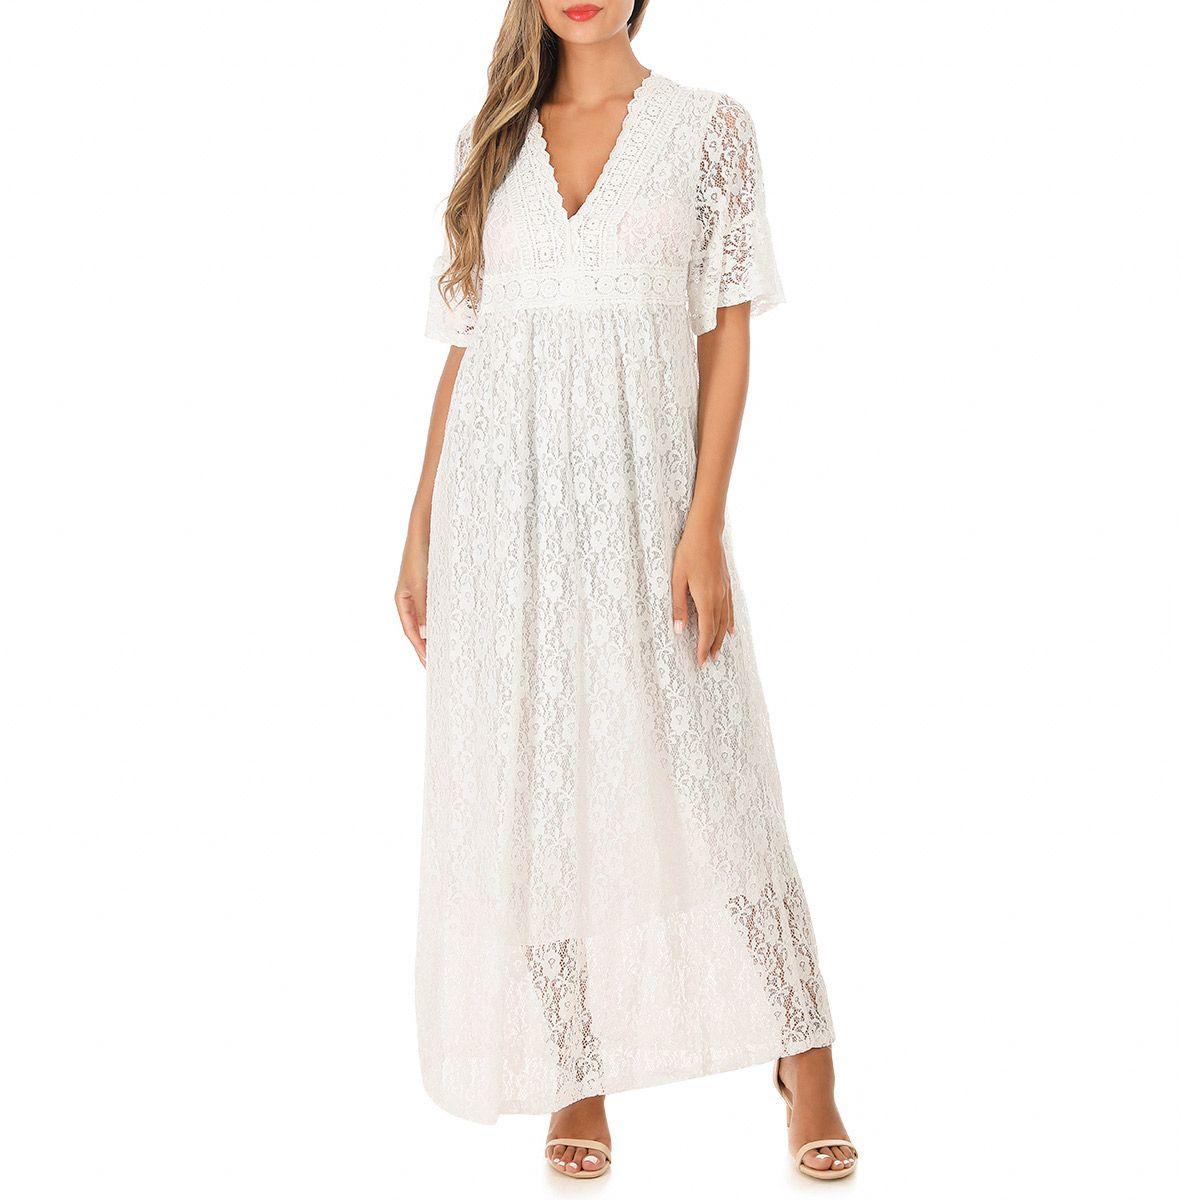 Robe blanche dentelle longue